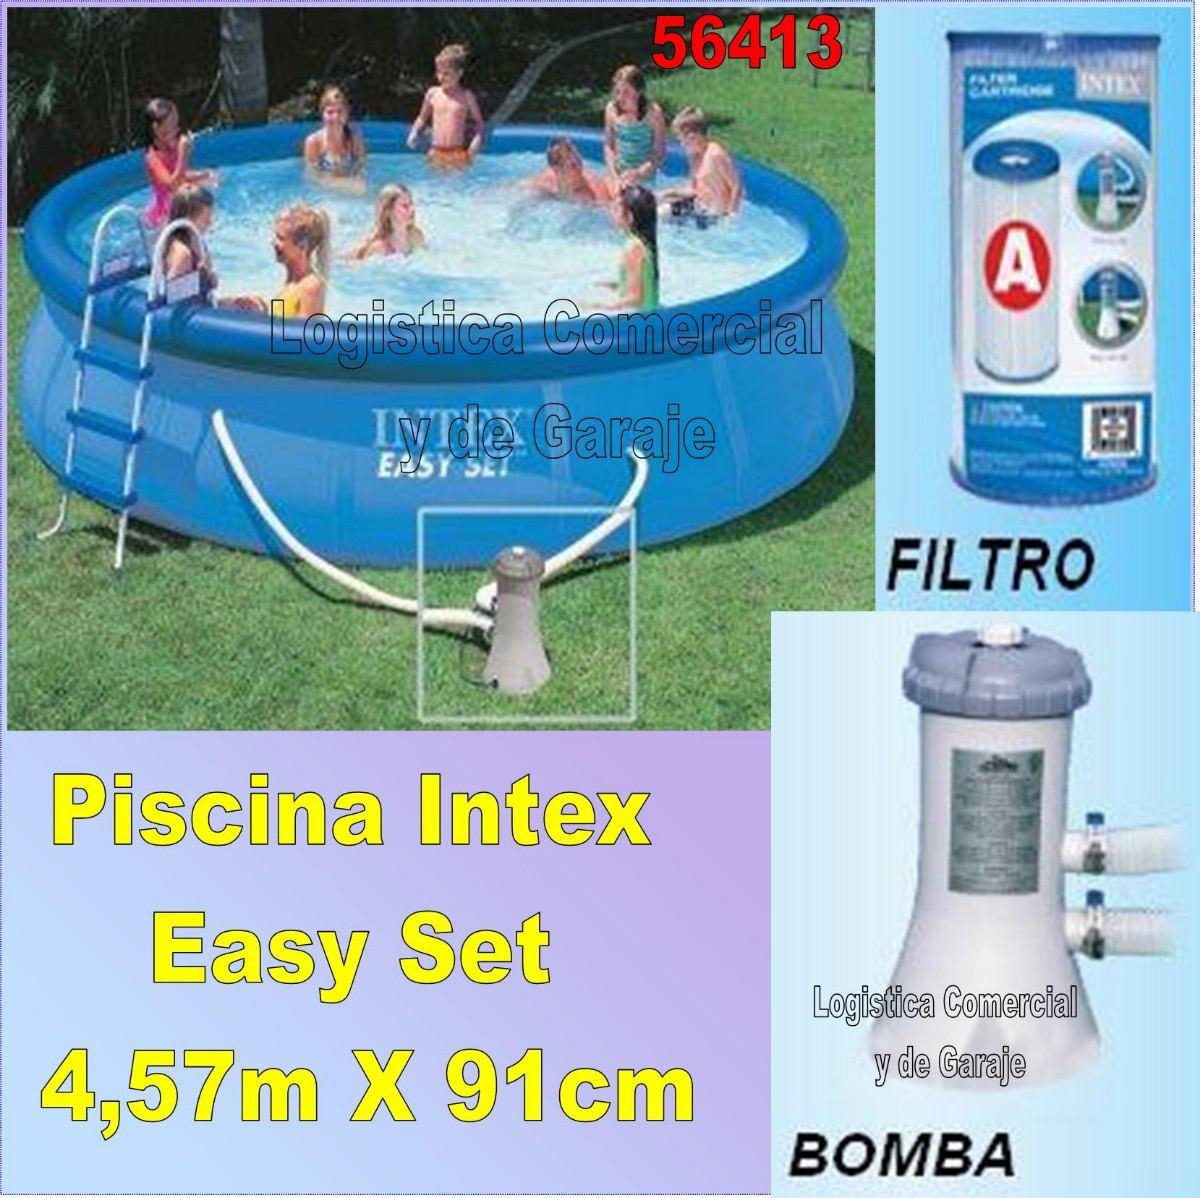 Piscina intex bestway 457x91cm bomba filtrante for X treme bombas piscinas